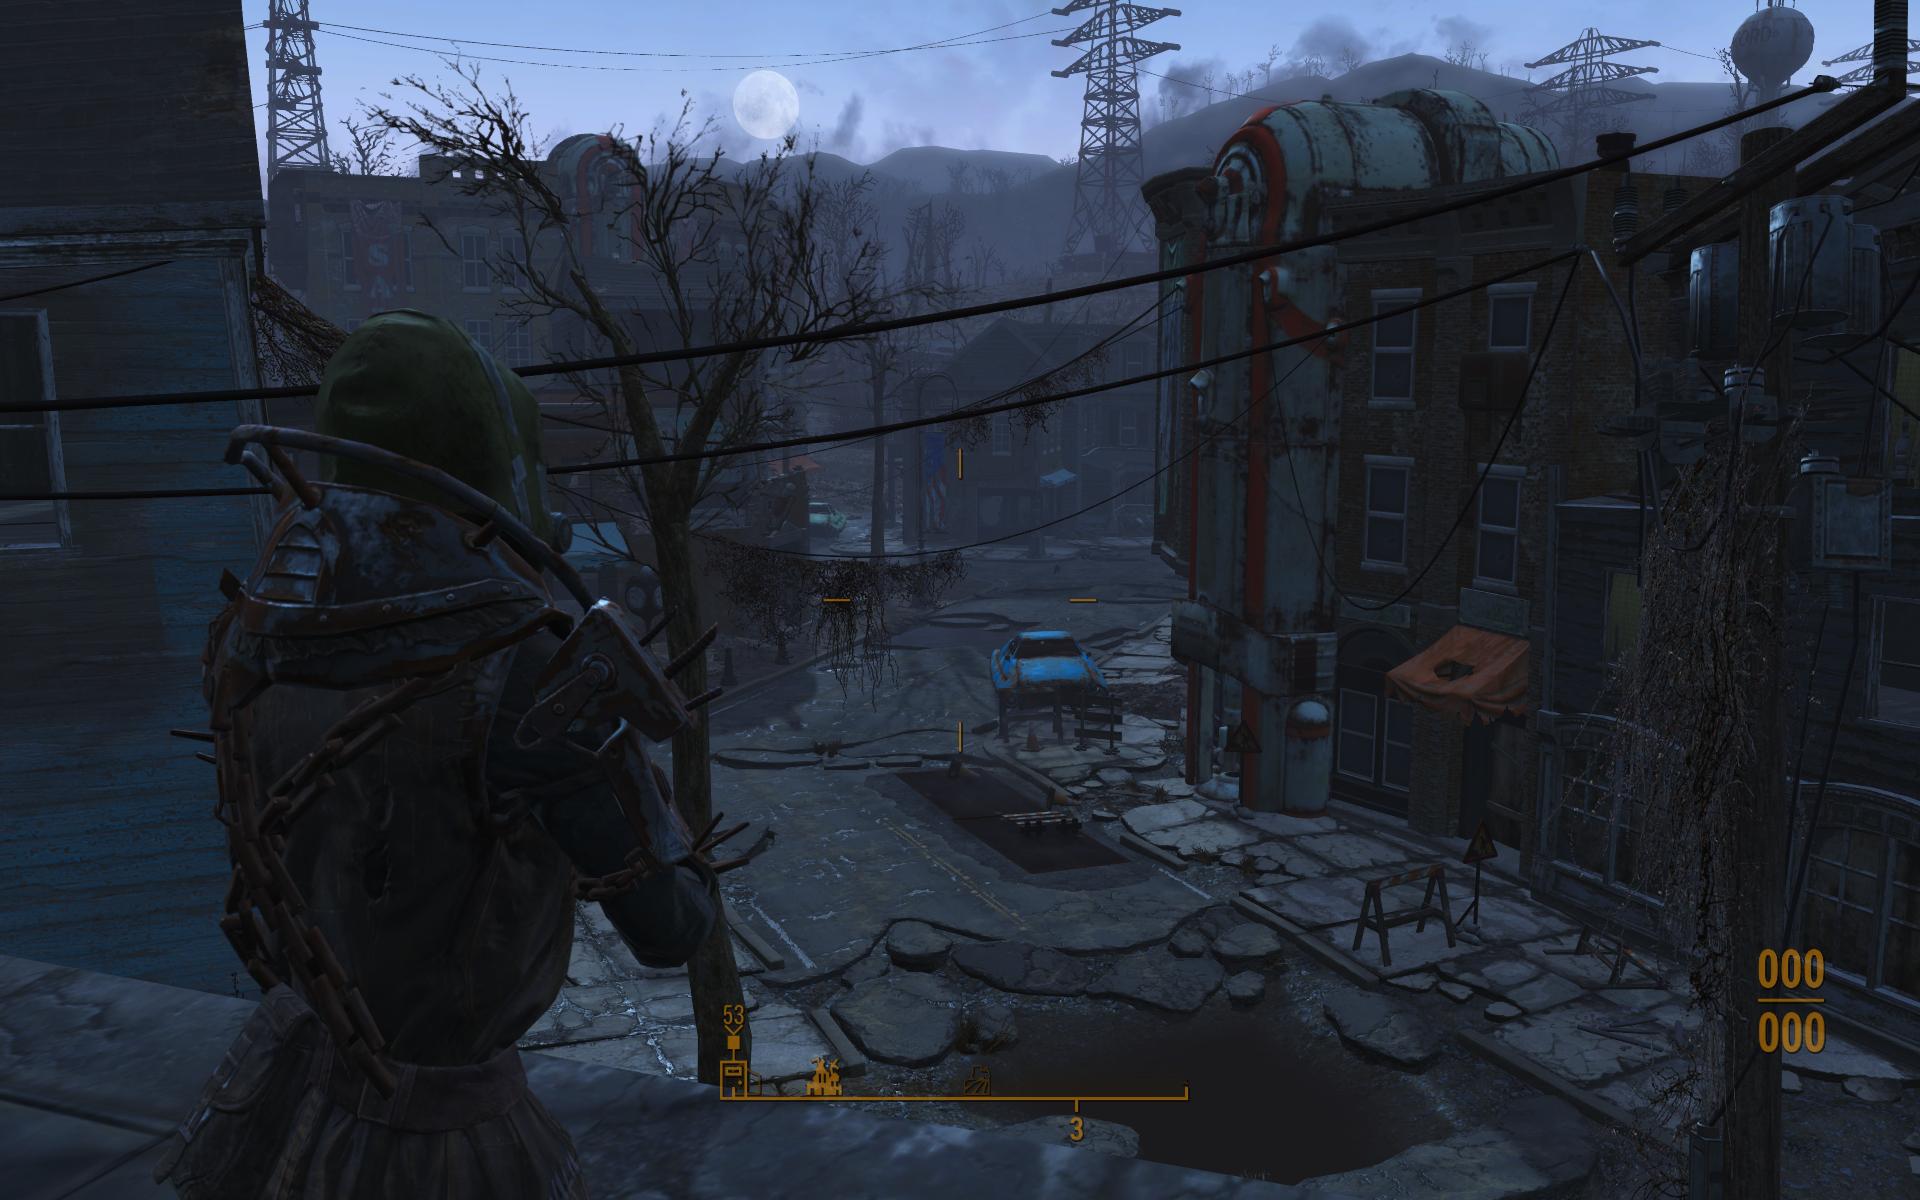 scr 003 - Fallout 4